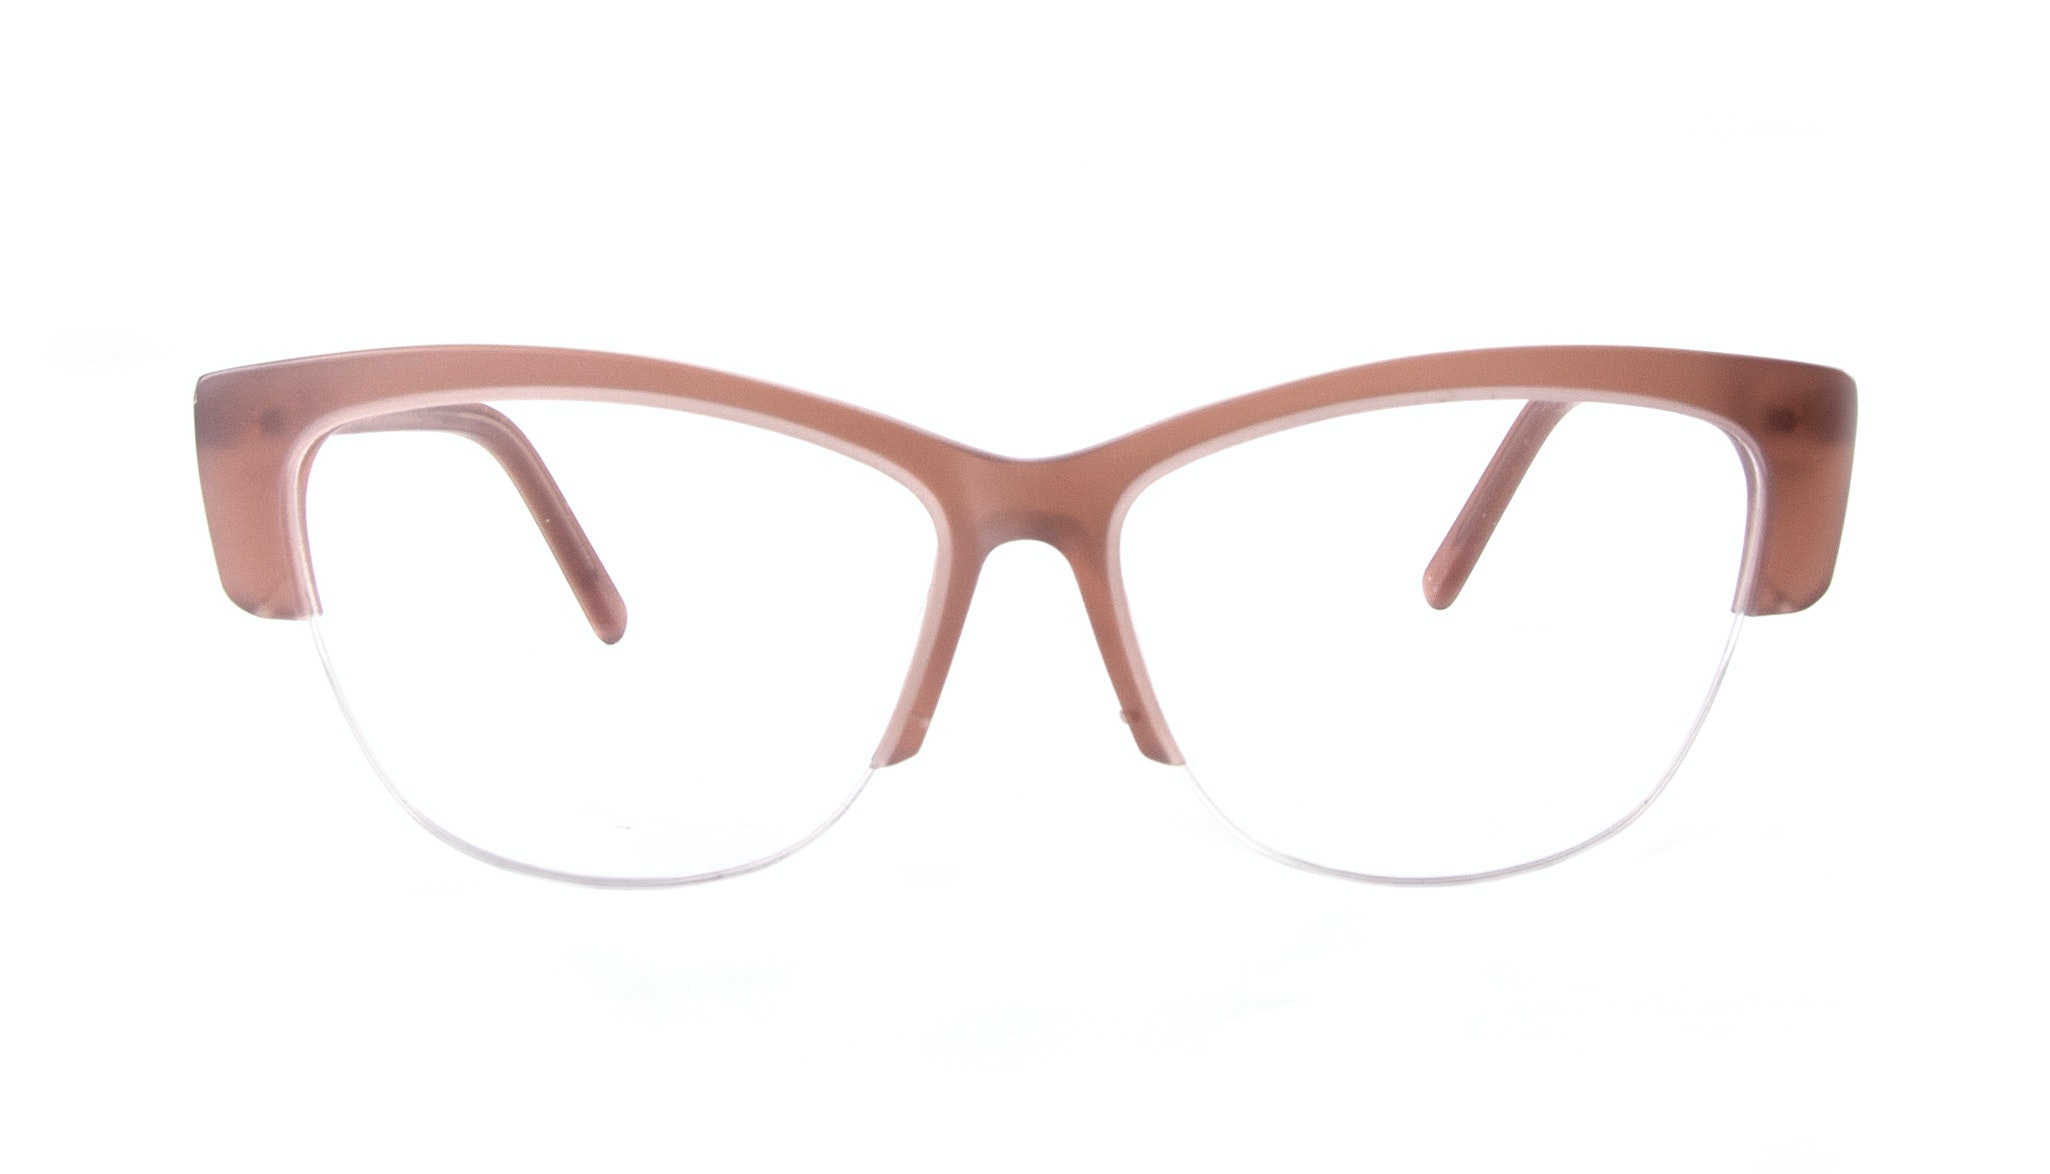 Affordable Fashion Glasses Cat Eye Semi-Rimless Eyeglasses Women Dolled Up Light Old Rose